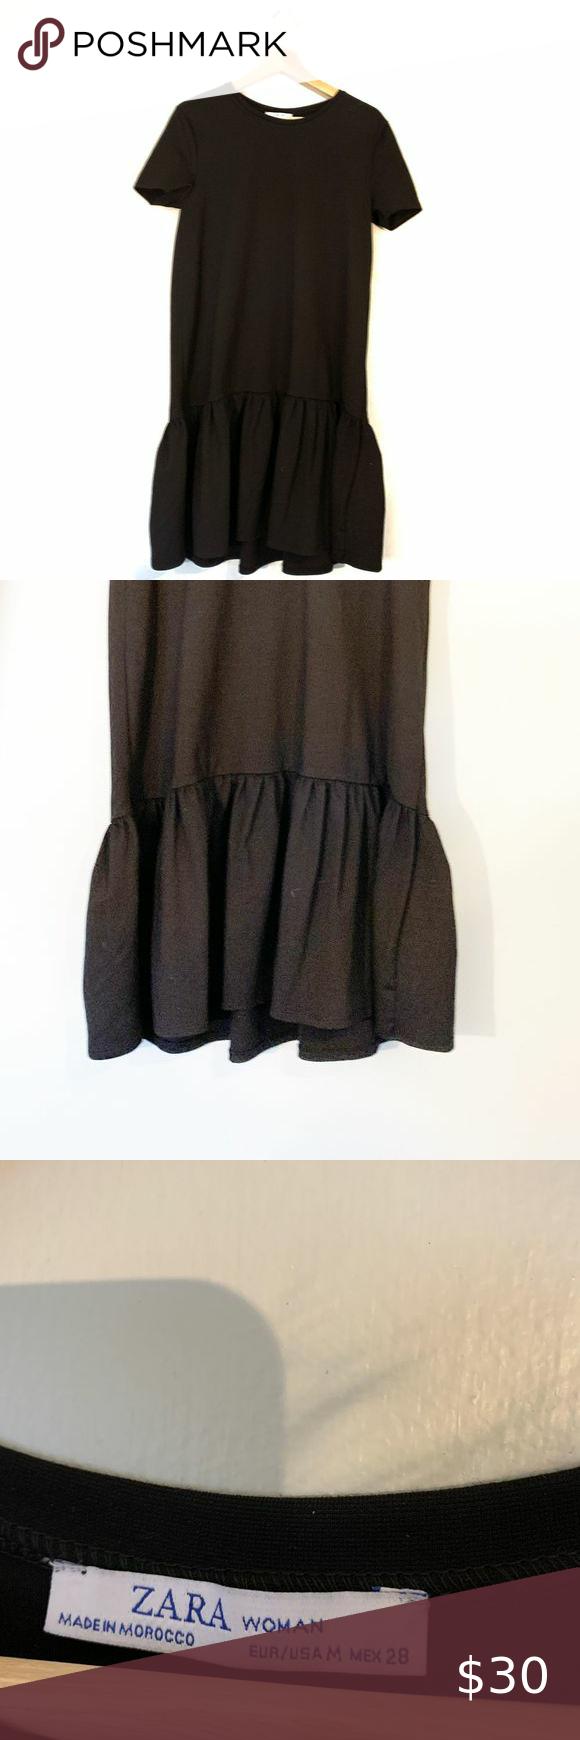 Zara Basic Black Sack Dress Medium Zara Basic Black Sack Dress Medium Straight Below The Knee Midi Dress With Ruffle Bot Sack Dress Clothes Design Zara Basic [ 1740 x 580 Pixel ]